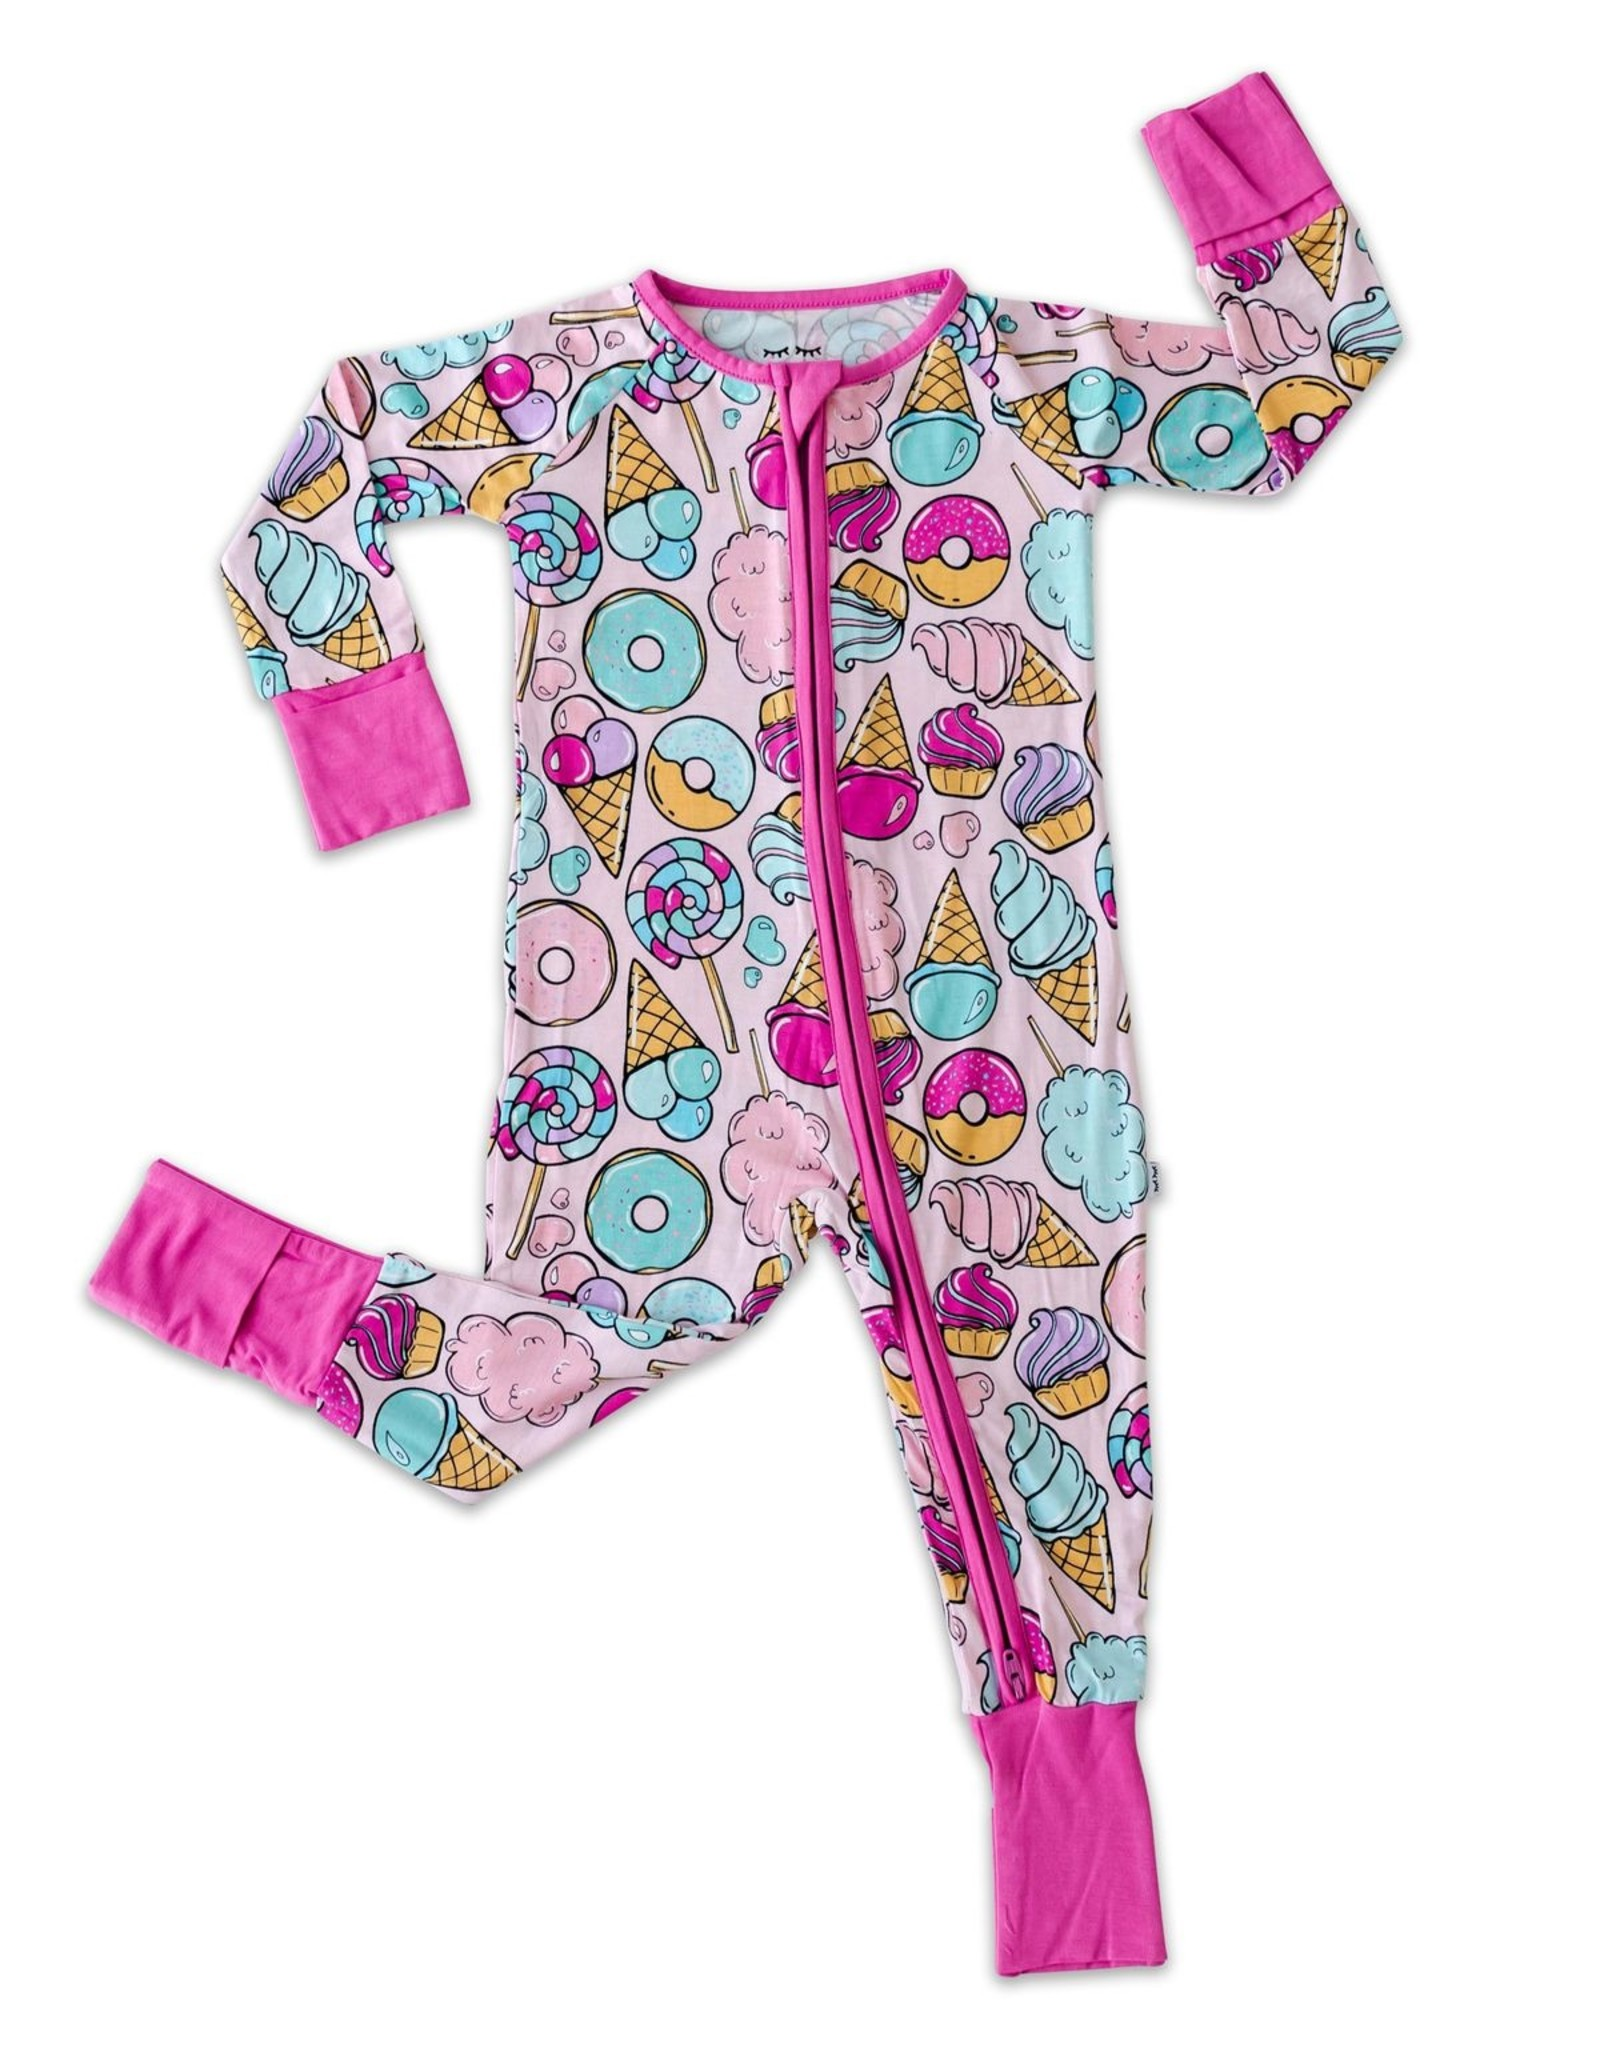 Little Sleepies pink sweet treats zippy